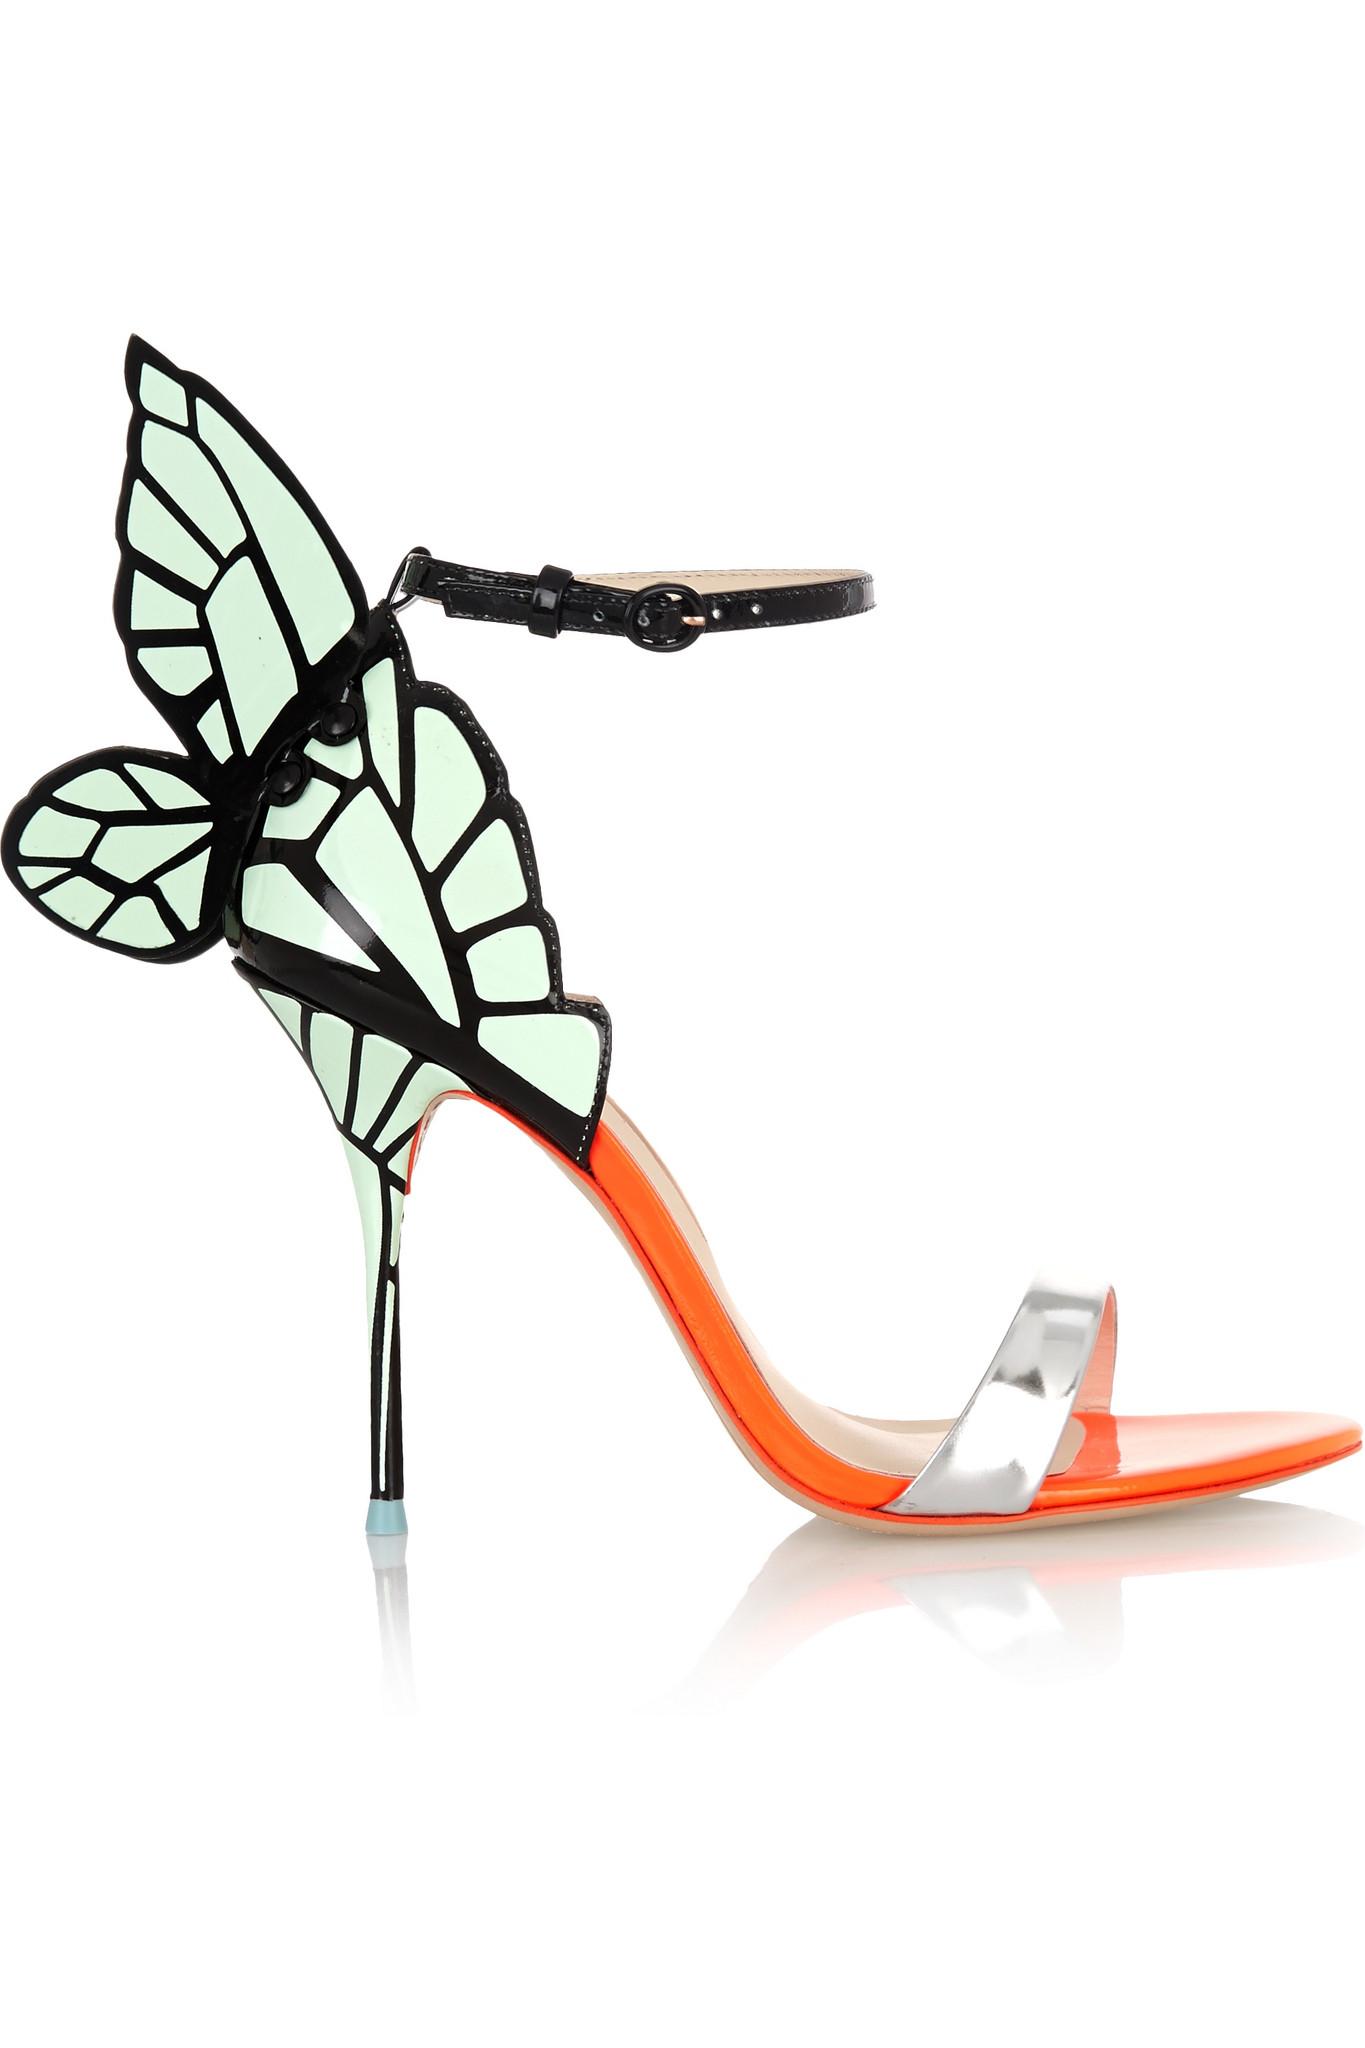 65f8b42fa14 Sophia Webster Chiara Neon Patent-leather Sandals in Metallic - Lyst